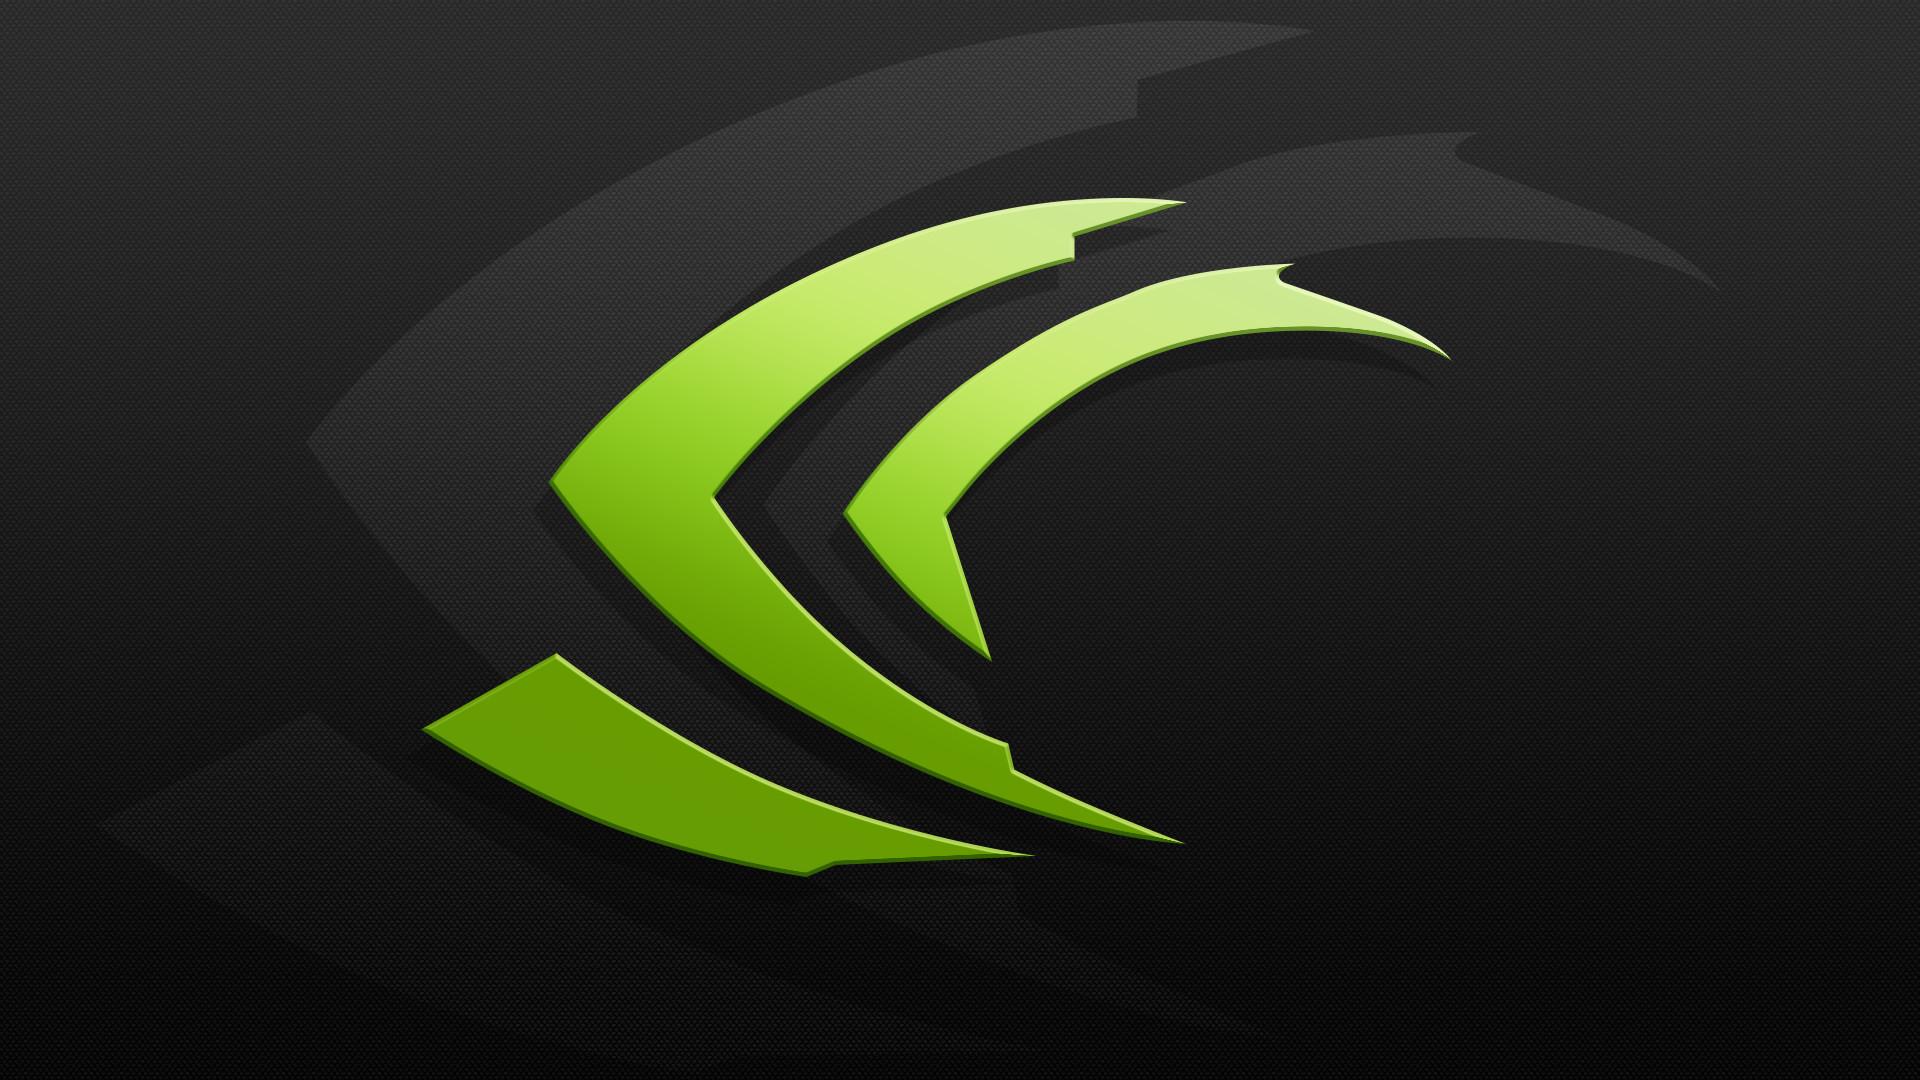 Nvidia Full HD Wallpaper 1920×1080